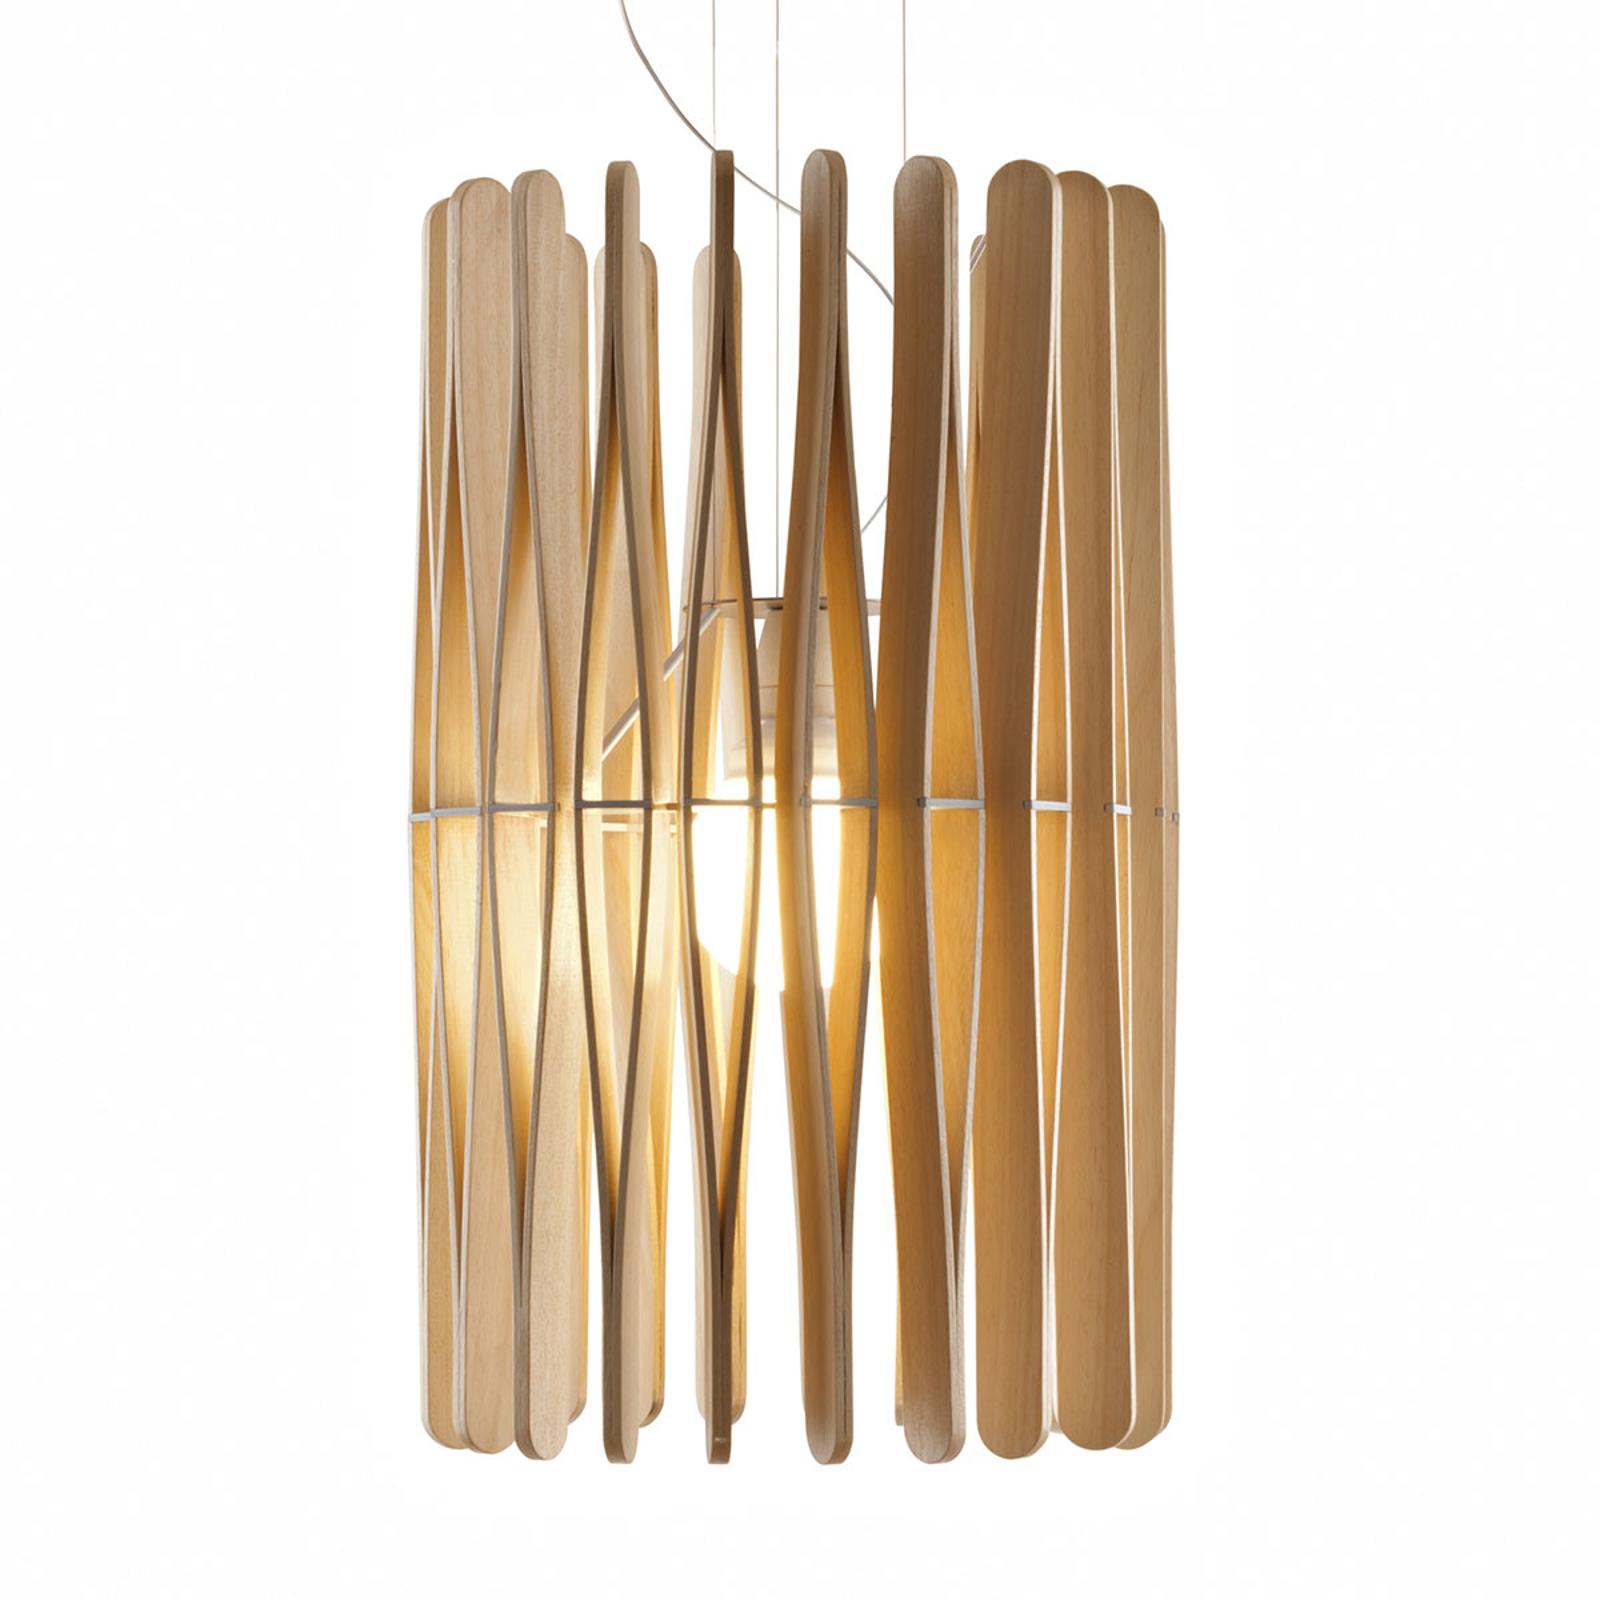 Fabbian Stick Holz-Hängeleuchte, zylindrisch, 43cm